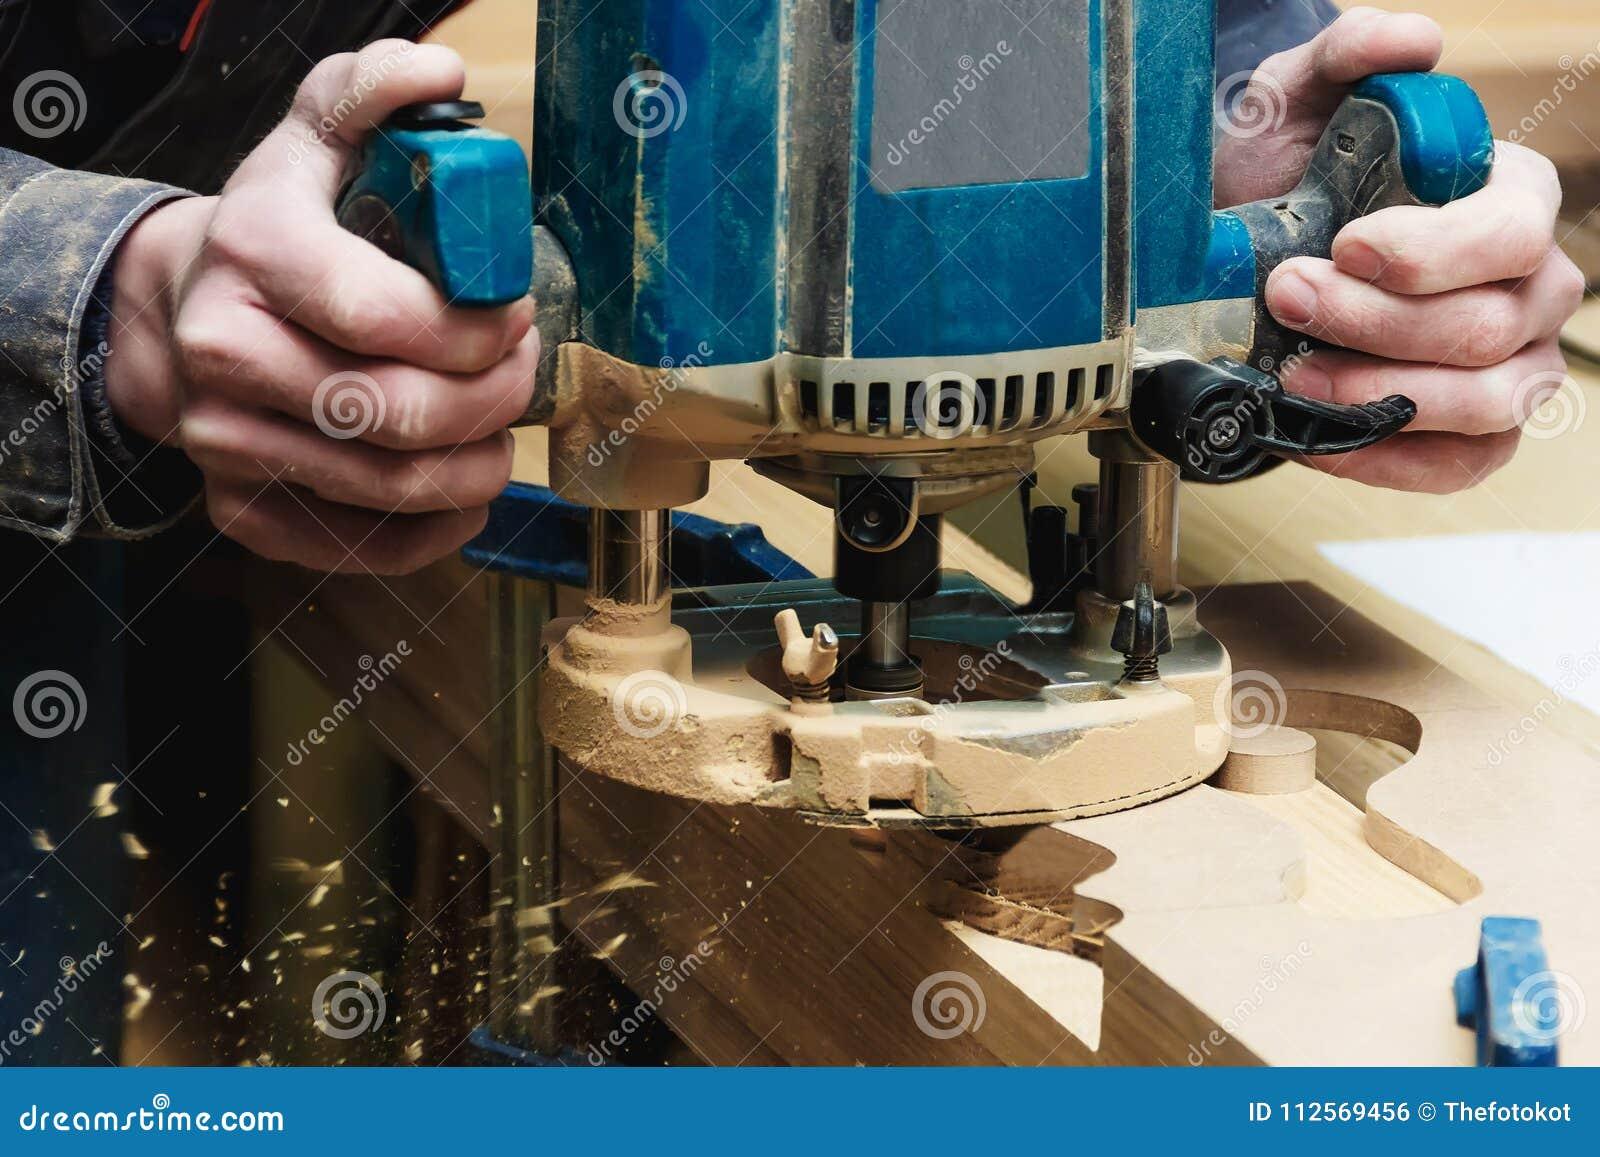 Carpenter Working of Manual Milling Machine in Carpentry Workshop. Industrial Manufactoring Concept.